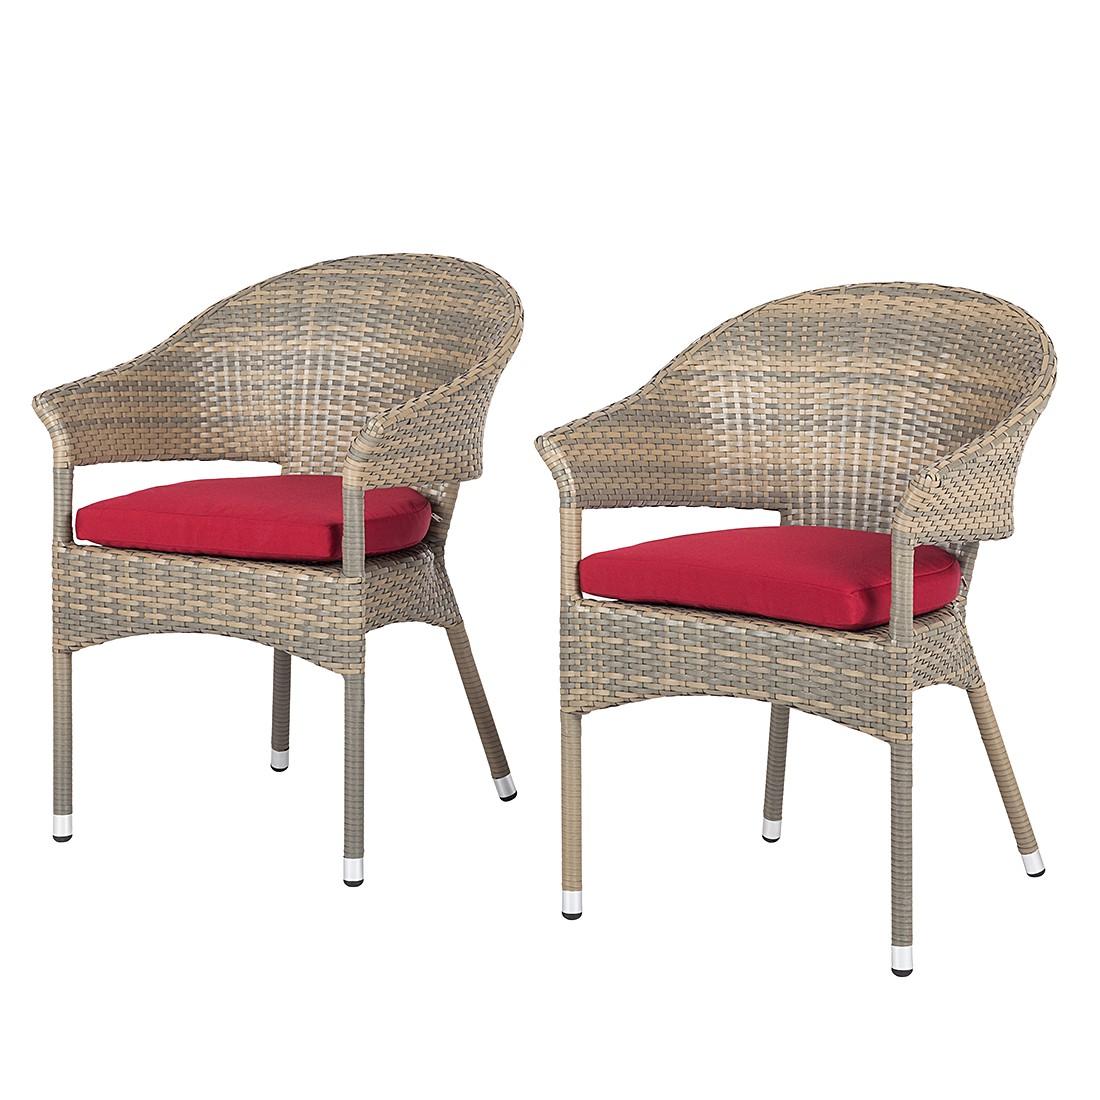 gartensessel felice 2er set polyrattan anthrazit rot ebay. Black Bedroom Furniture Sets. Home Design Ideas